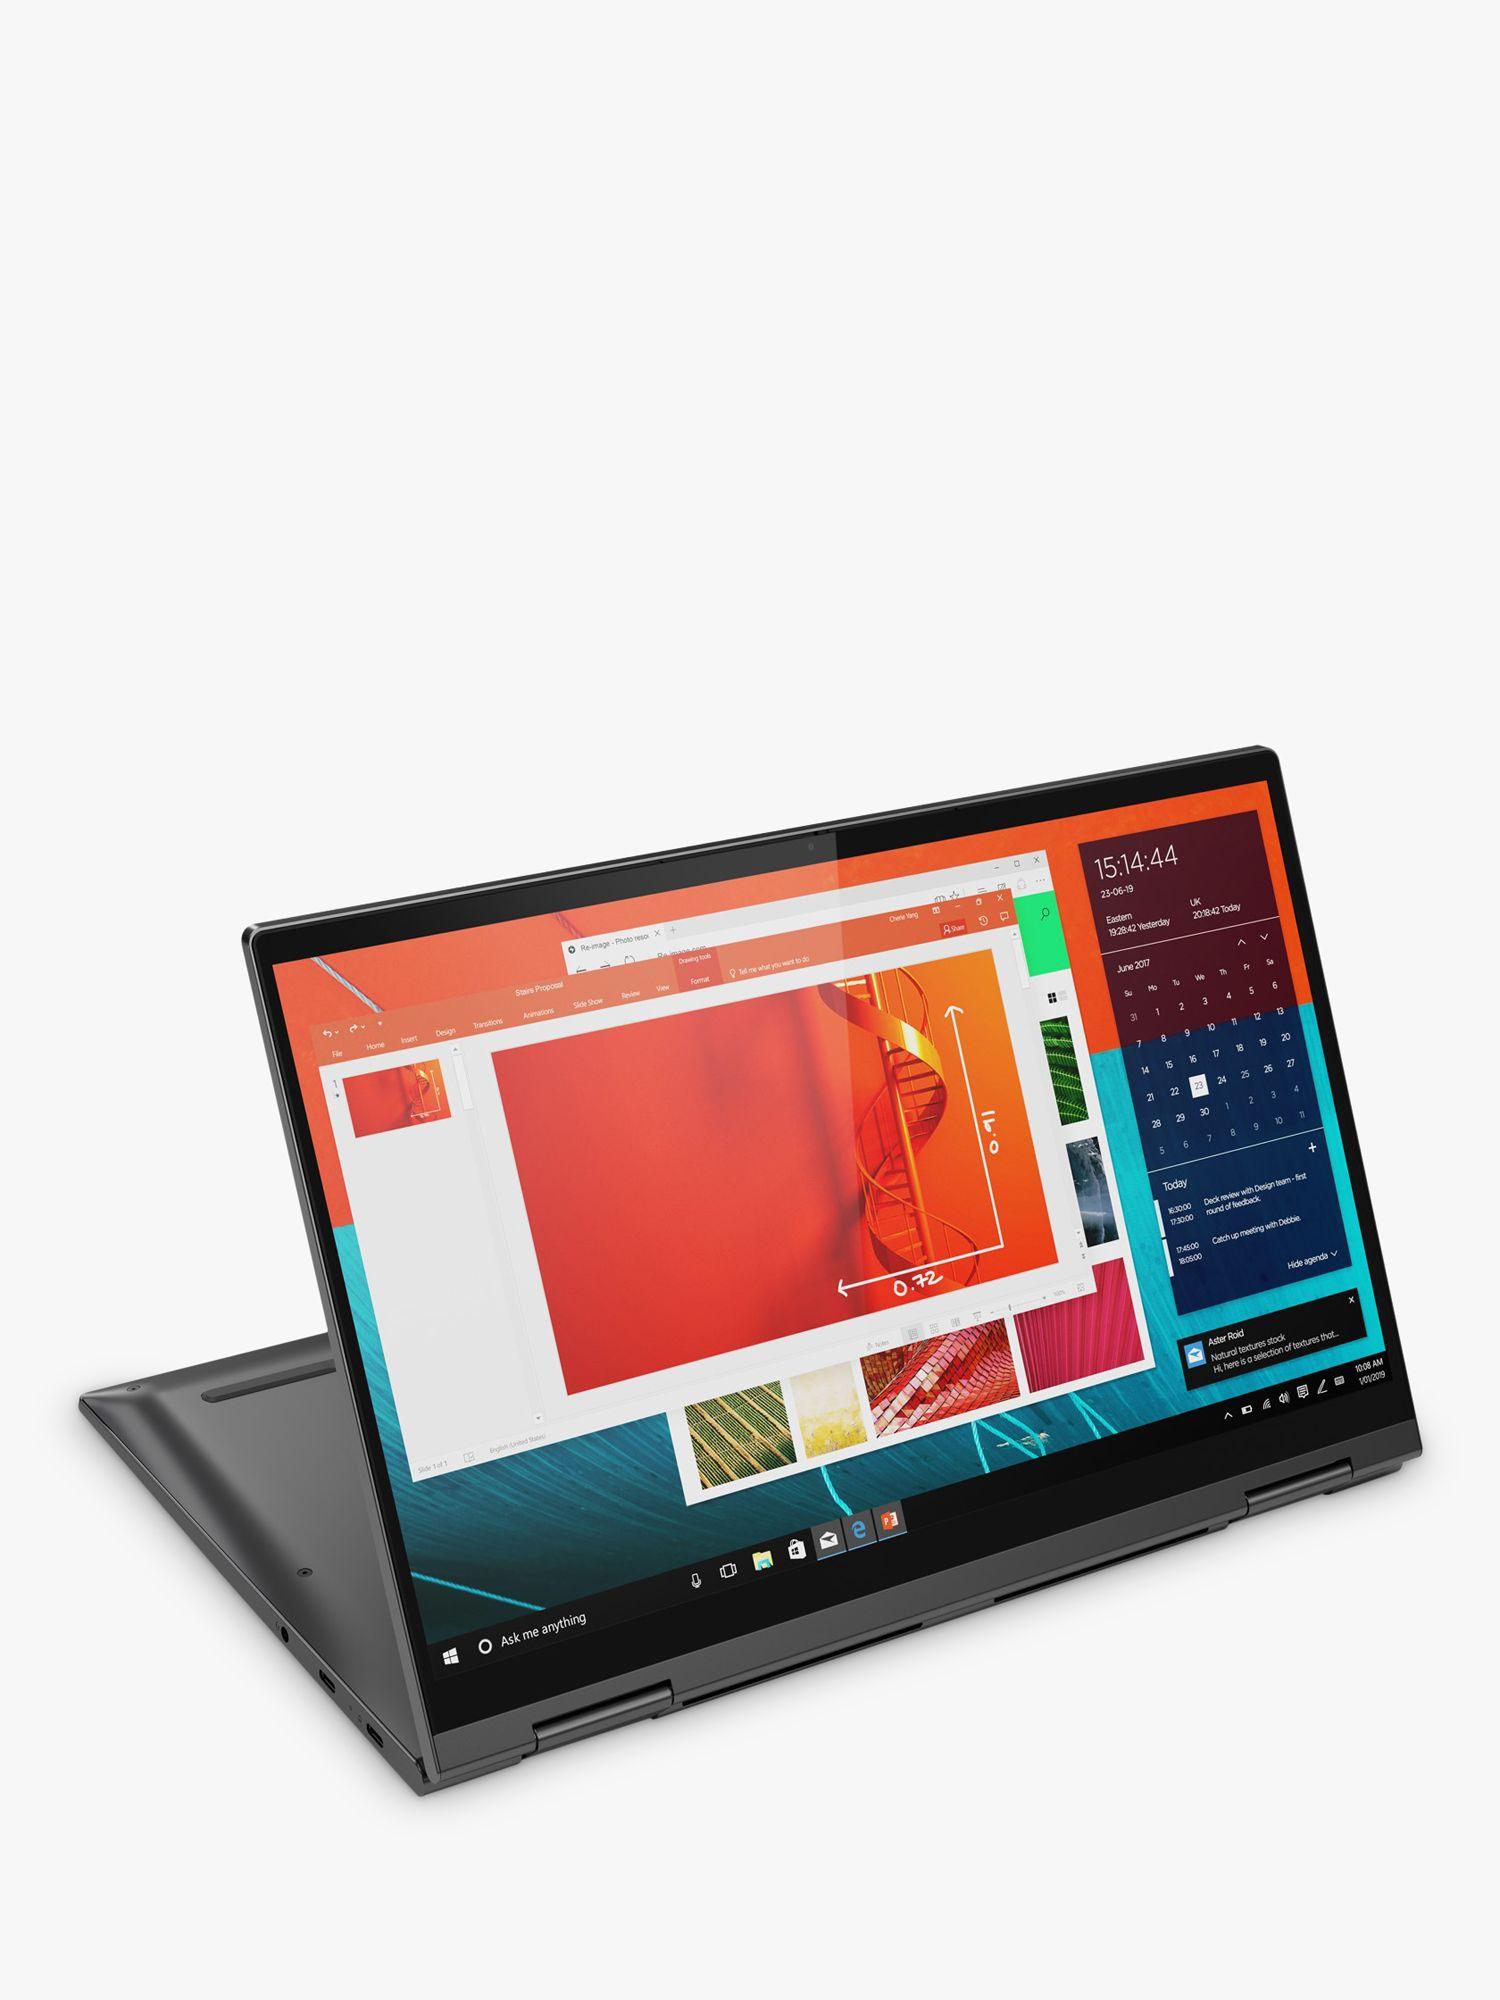 Lenovo Lenovo YOGA C740-14IML Convertible Laptop, Intel Core i5 Processor, 8GB RAM, 256GB SSD, 14, Iron Grey